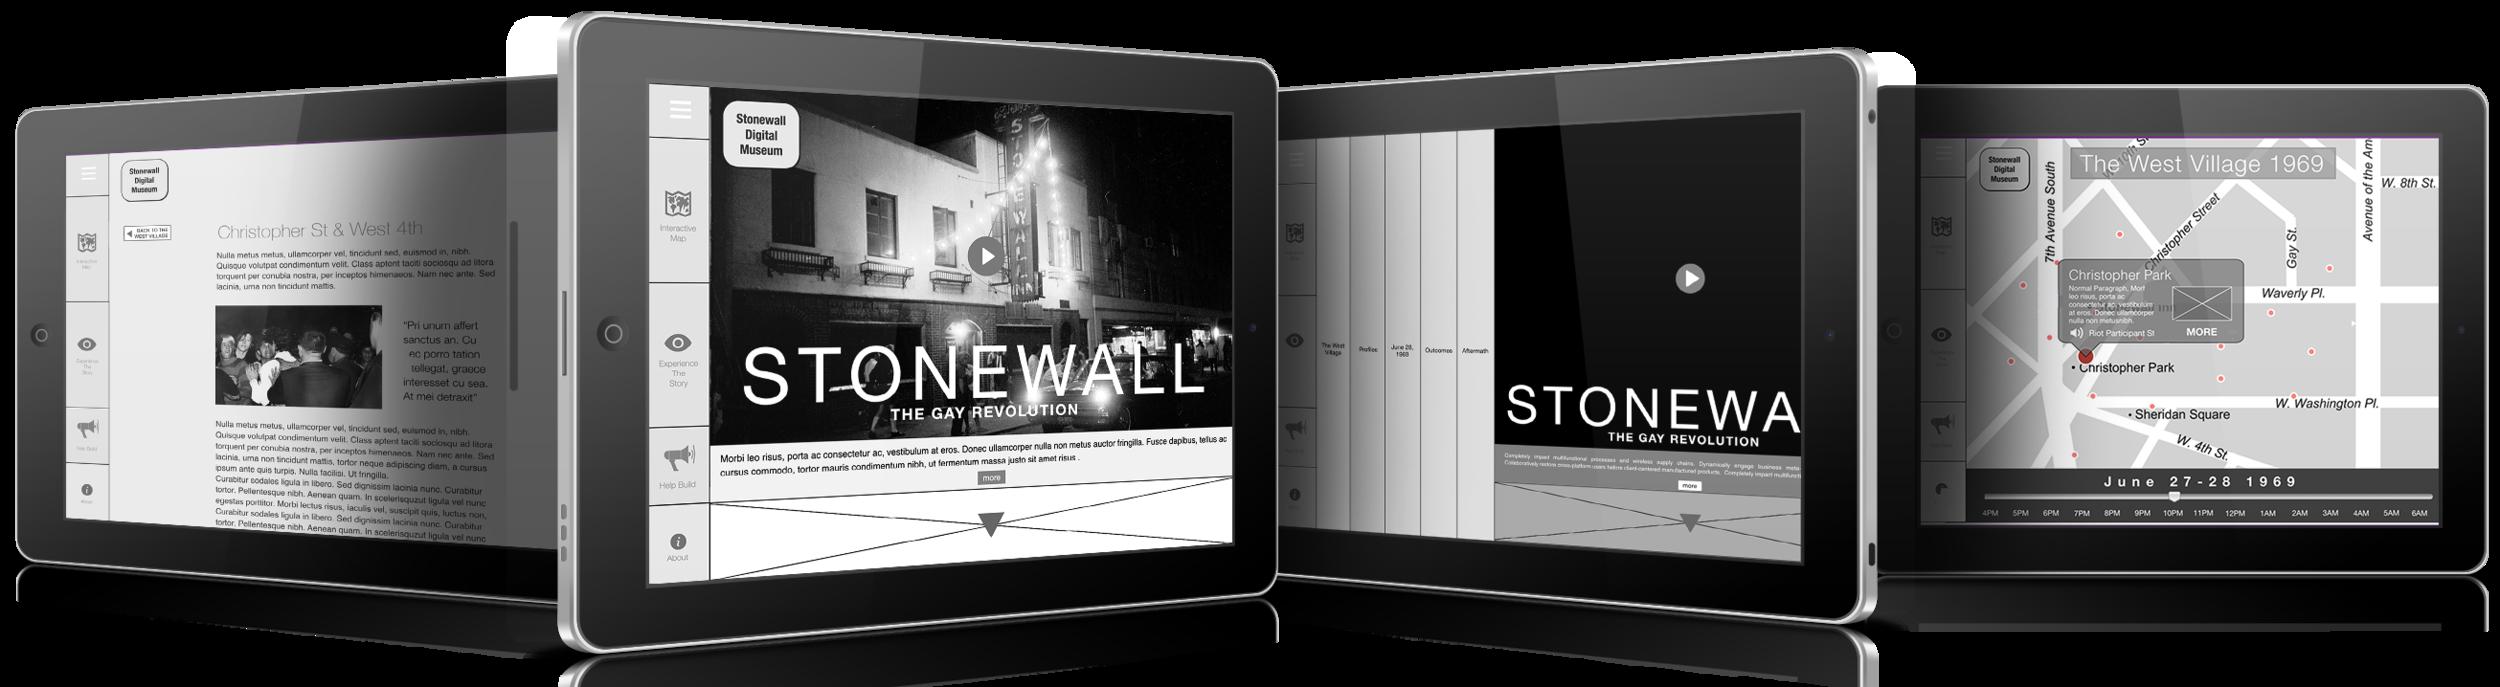 tablet_web_app_mockup_v2 Stonewall.png